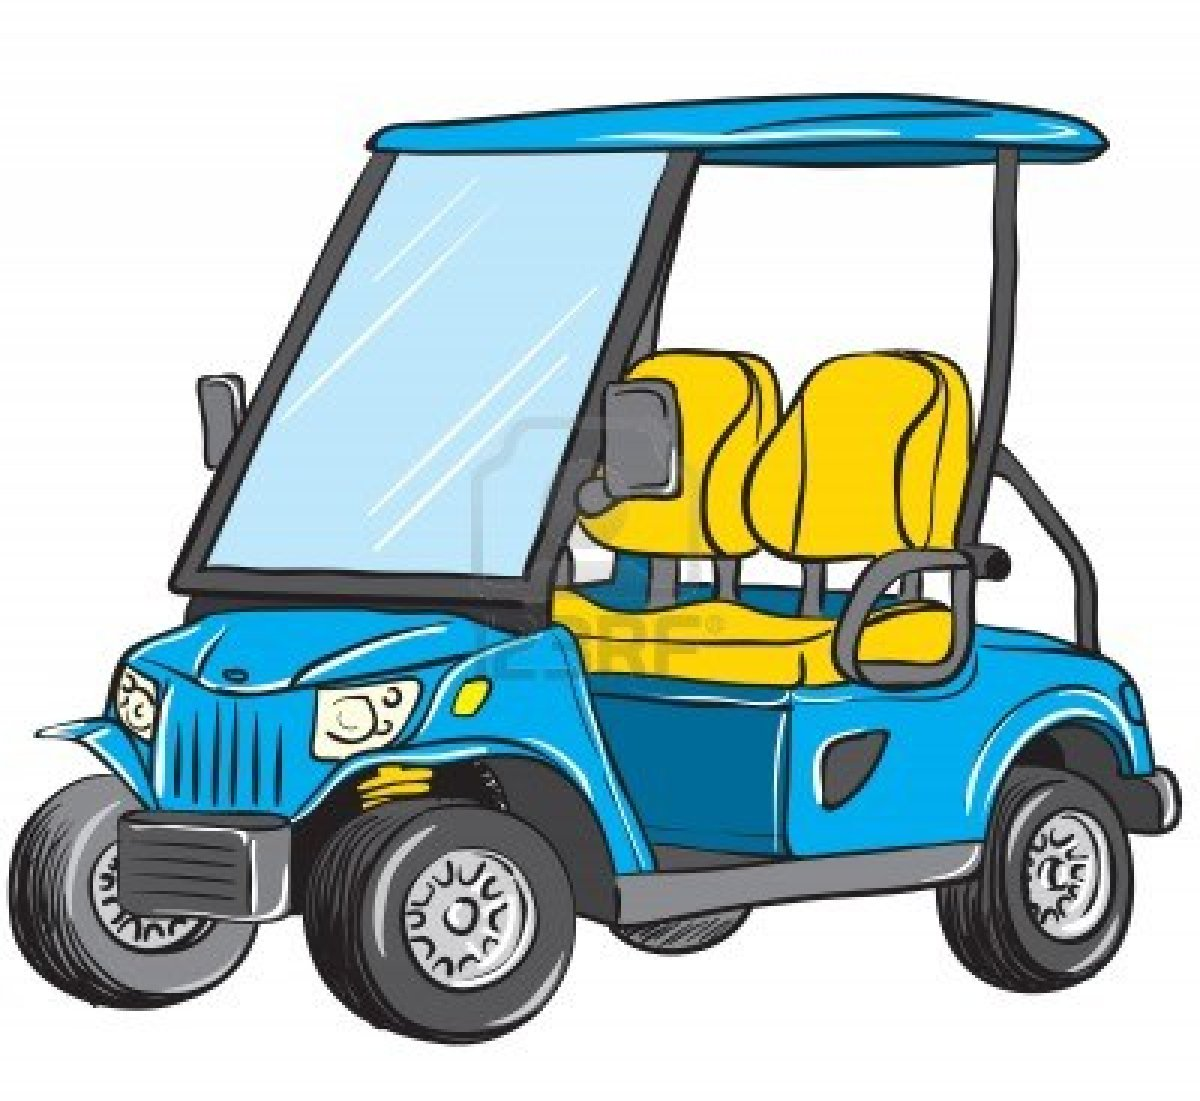 Clip Art Golf Cart Clipart funny golf cart clipart kid kids clip art panda free images